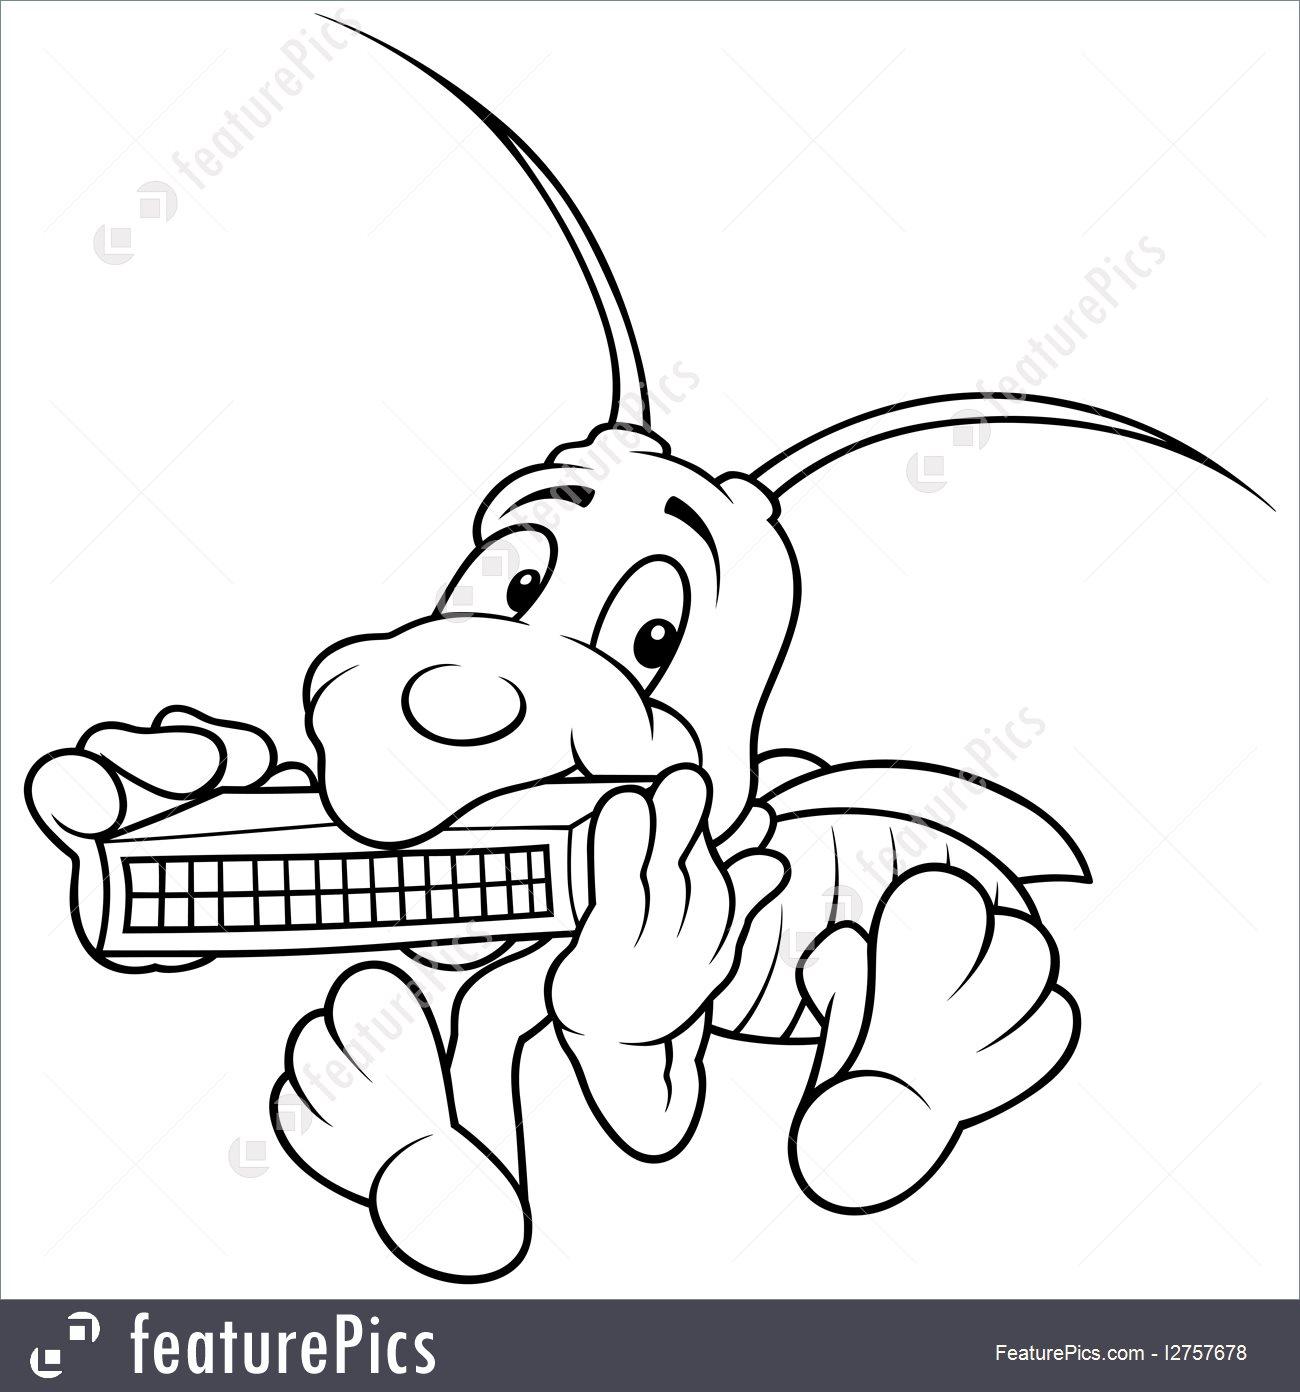 1300x1392 Grasshopper And Harmonica Cartoon Stock Illustration I2757678